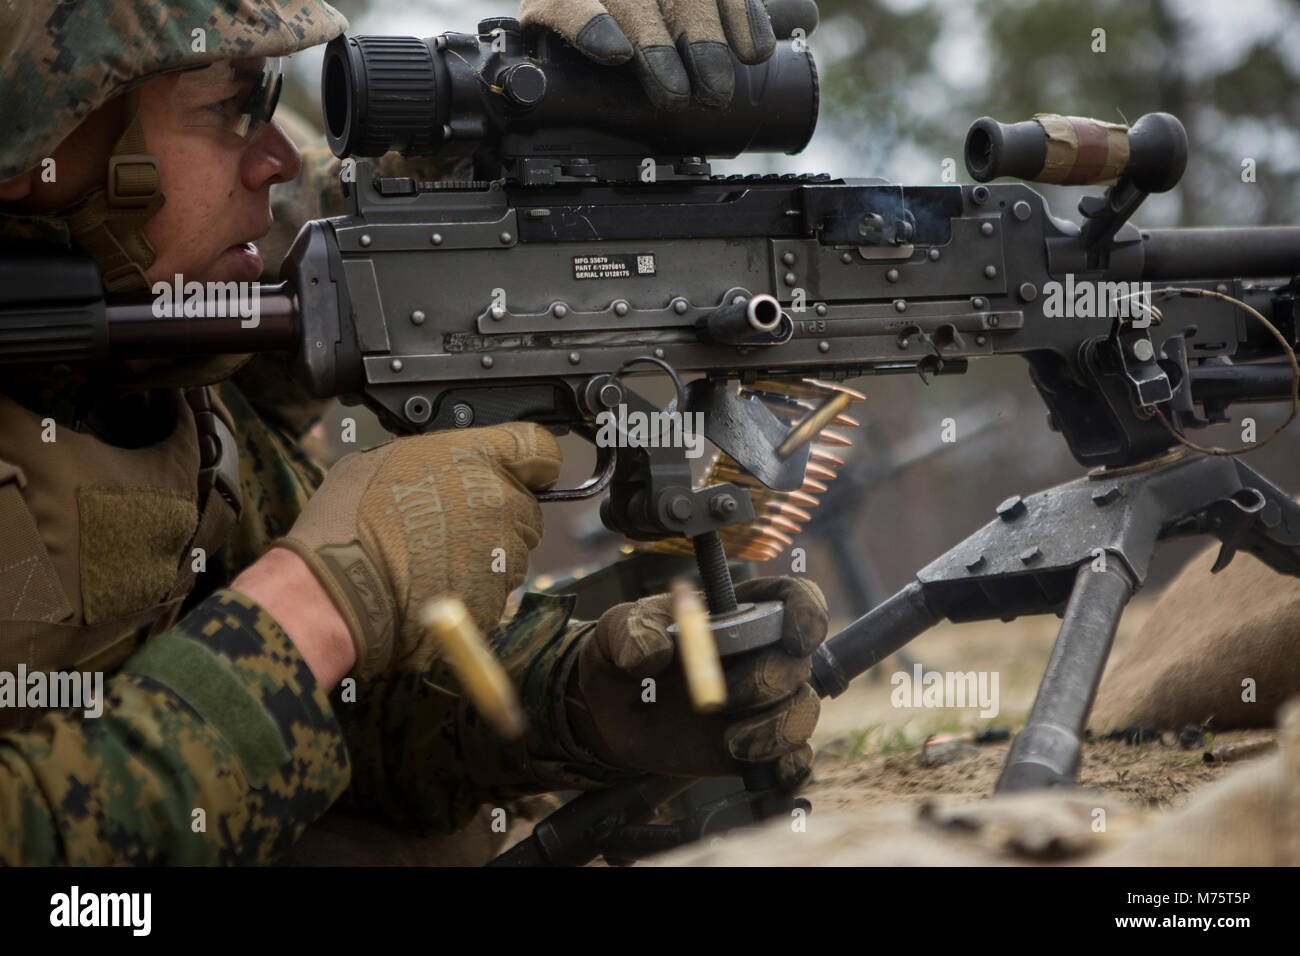 A U.S. Marine with Company L, 3rd Battalion, 2nd Marine Regiment, 2nd Marine Division, fires an M240B machine gun - Stock Image